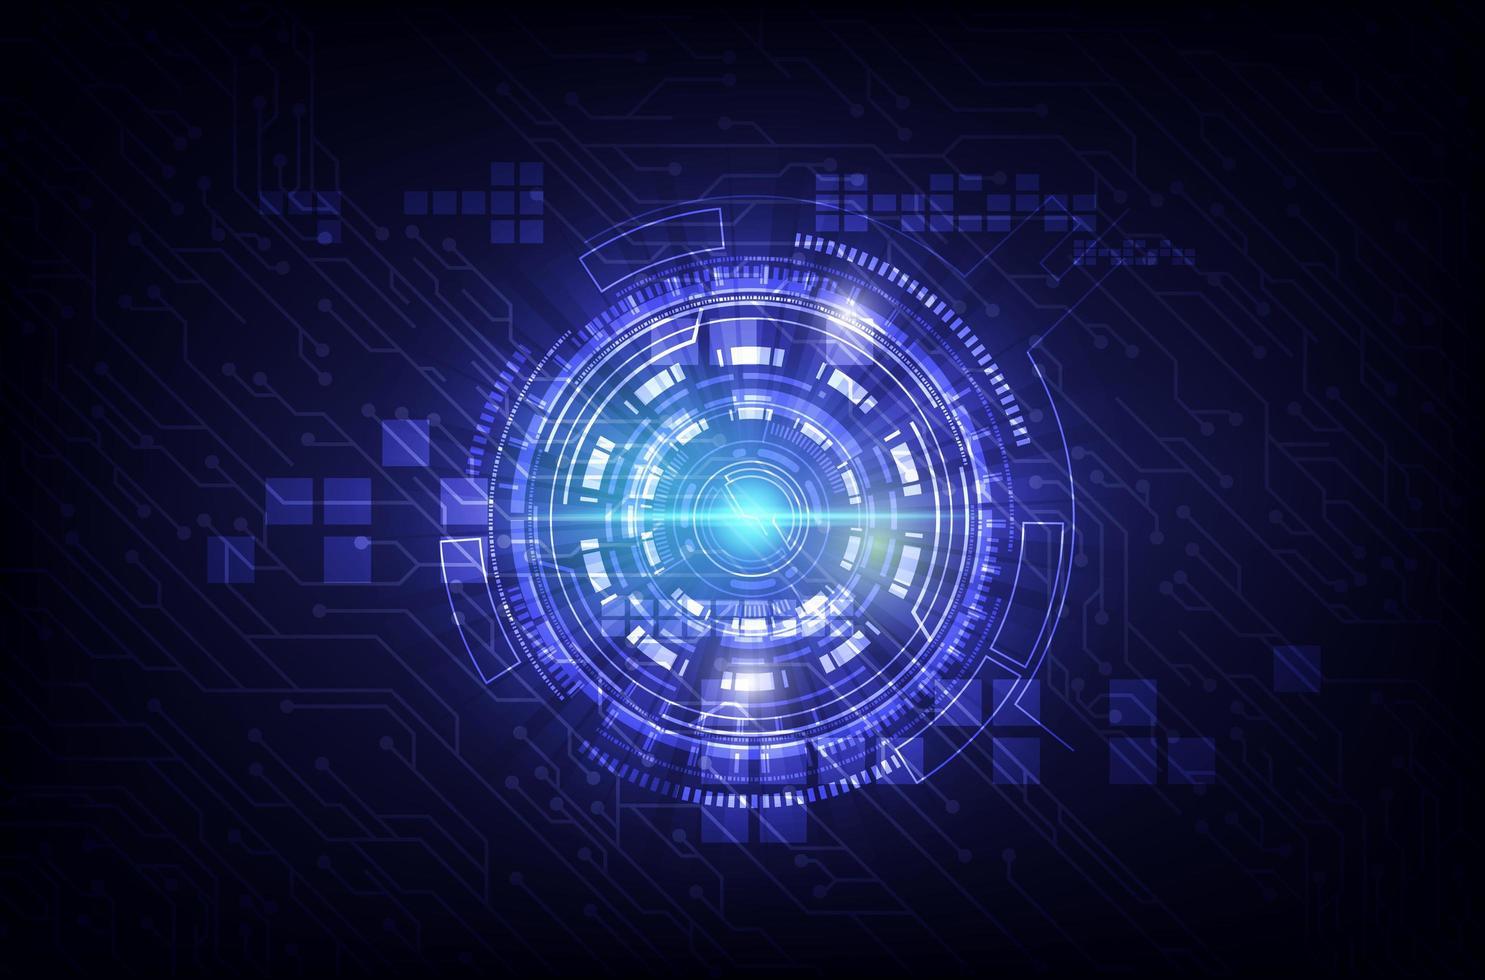 paars circuit en internettechnologieontwerp vector